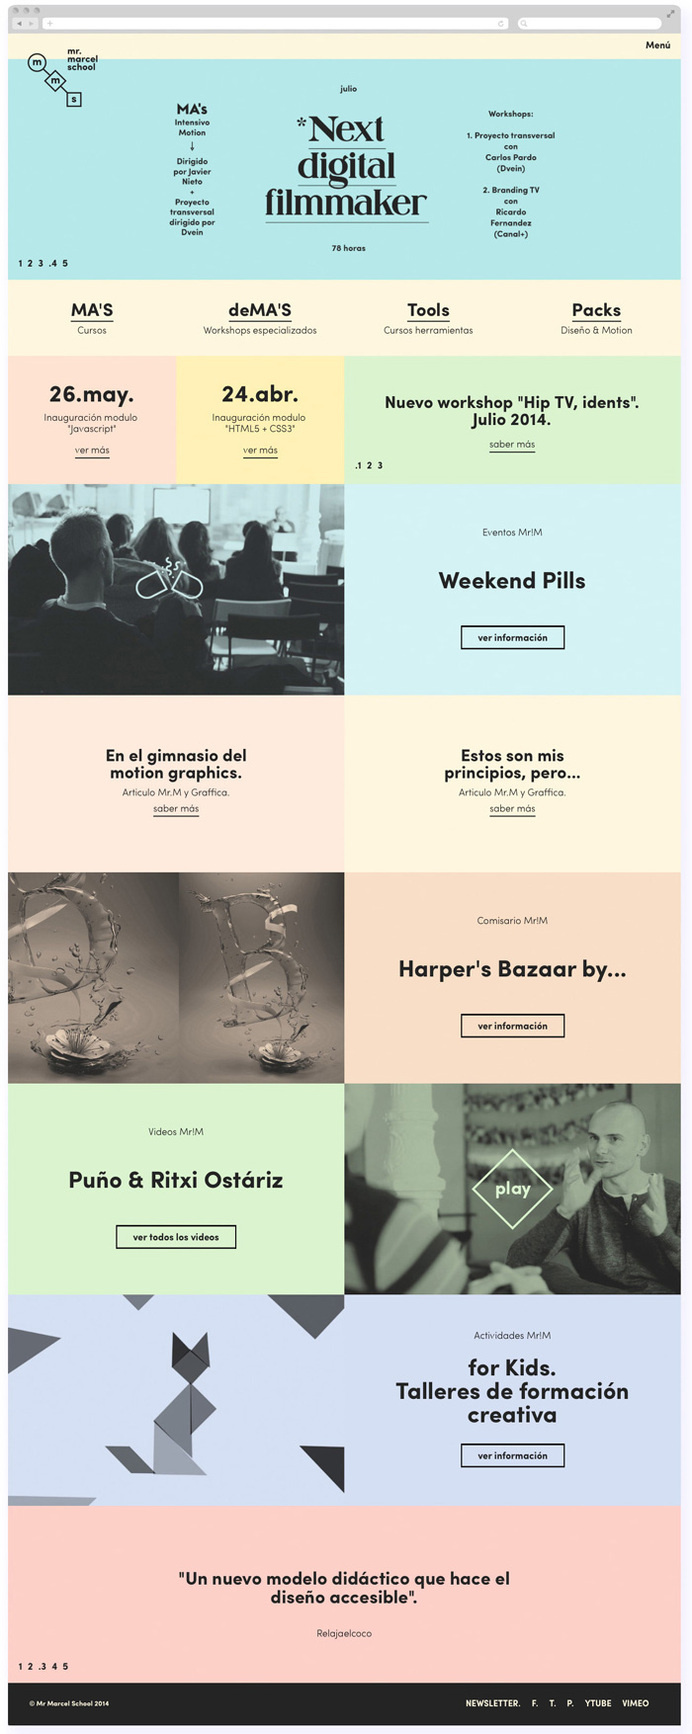 Tata&Friends: Mr. Marcel School Rebrand / on Design Work Life #layout #design #branding